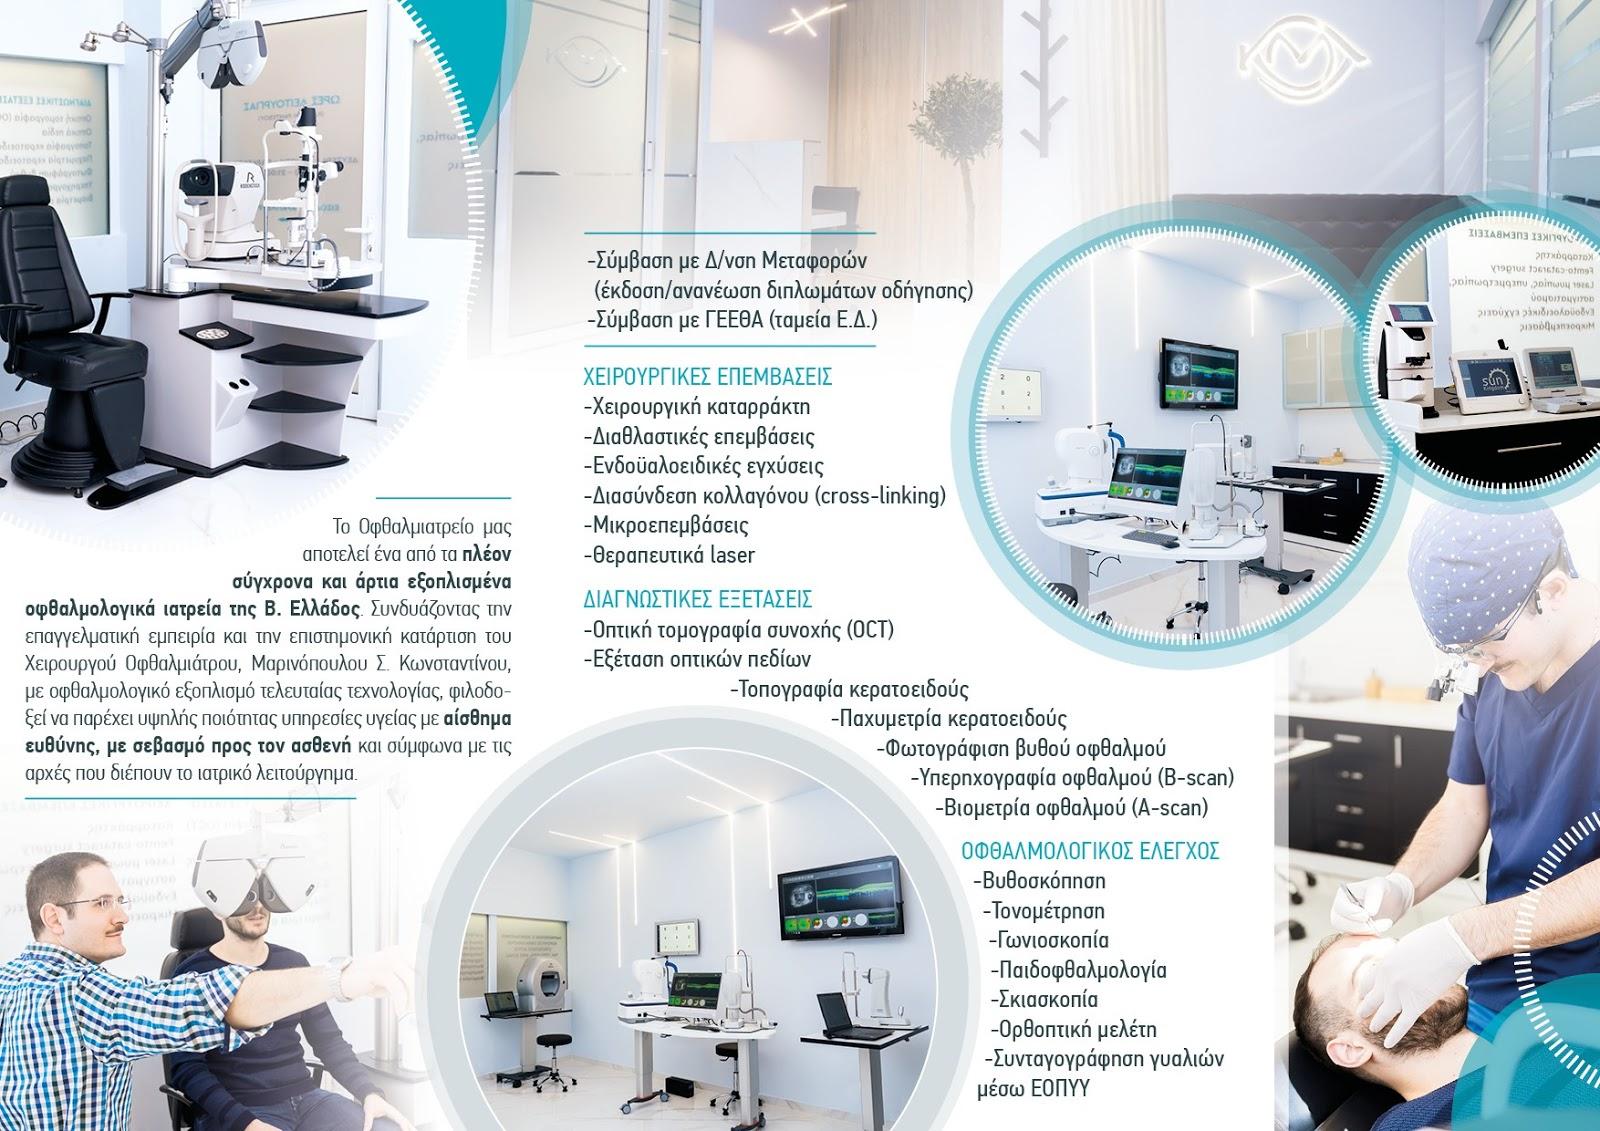 O Μαρινόπουλος Κωνσταντίνος σας Προσκαλεί στα Εγκαίνια του Οφθαλμολογικού Ιατρείου Του